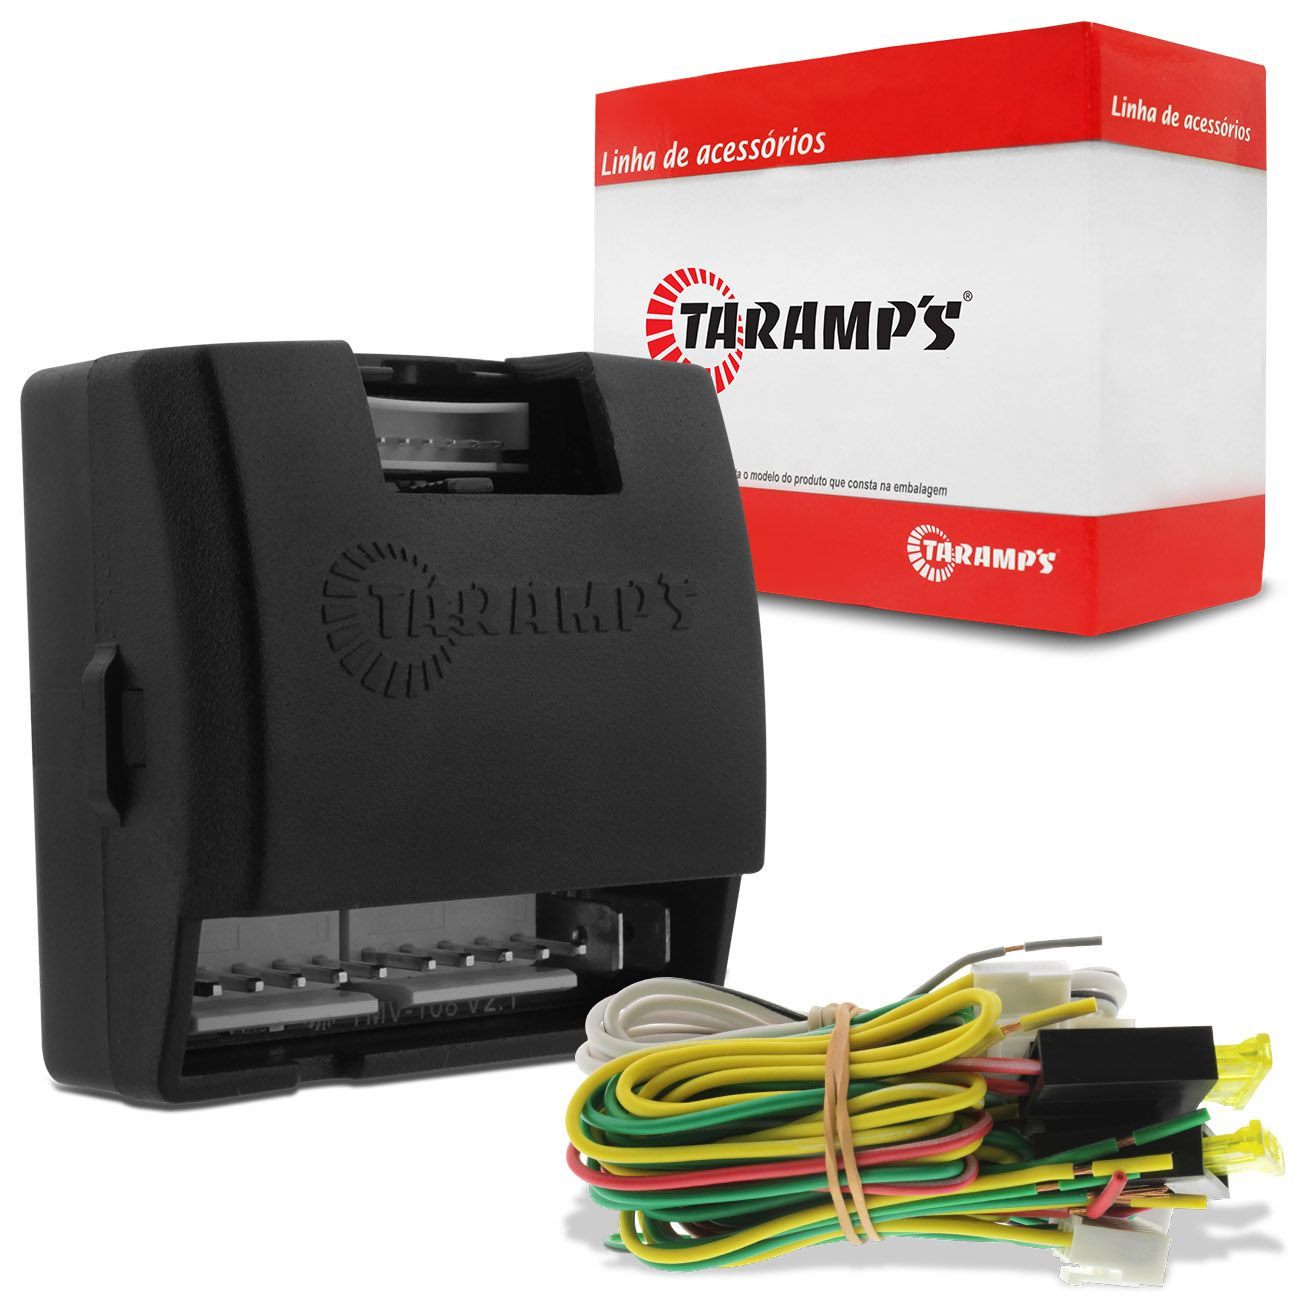 Módulo Subida Vidro Elétrico Taramps TMV 108 Universal 2 ou 4 Portas